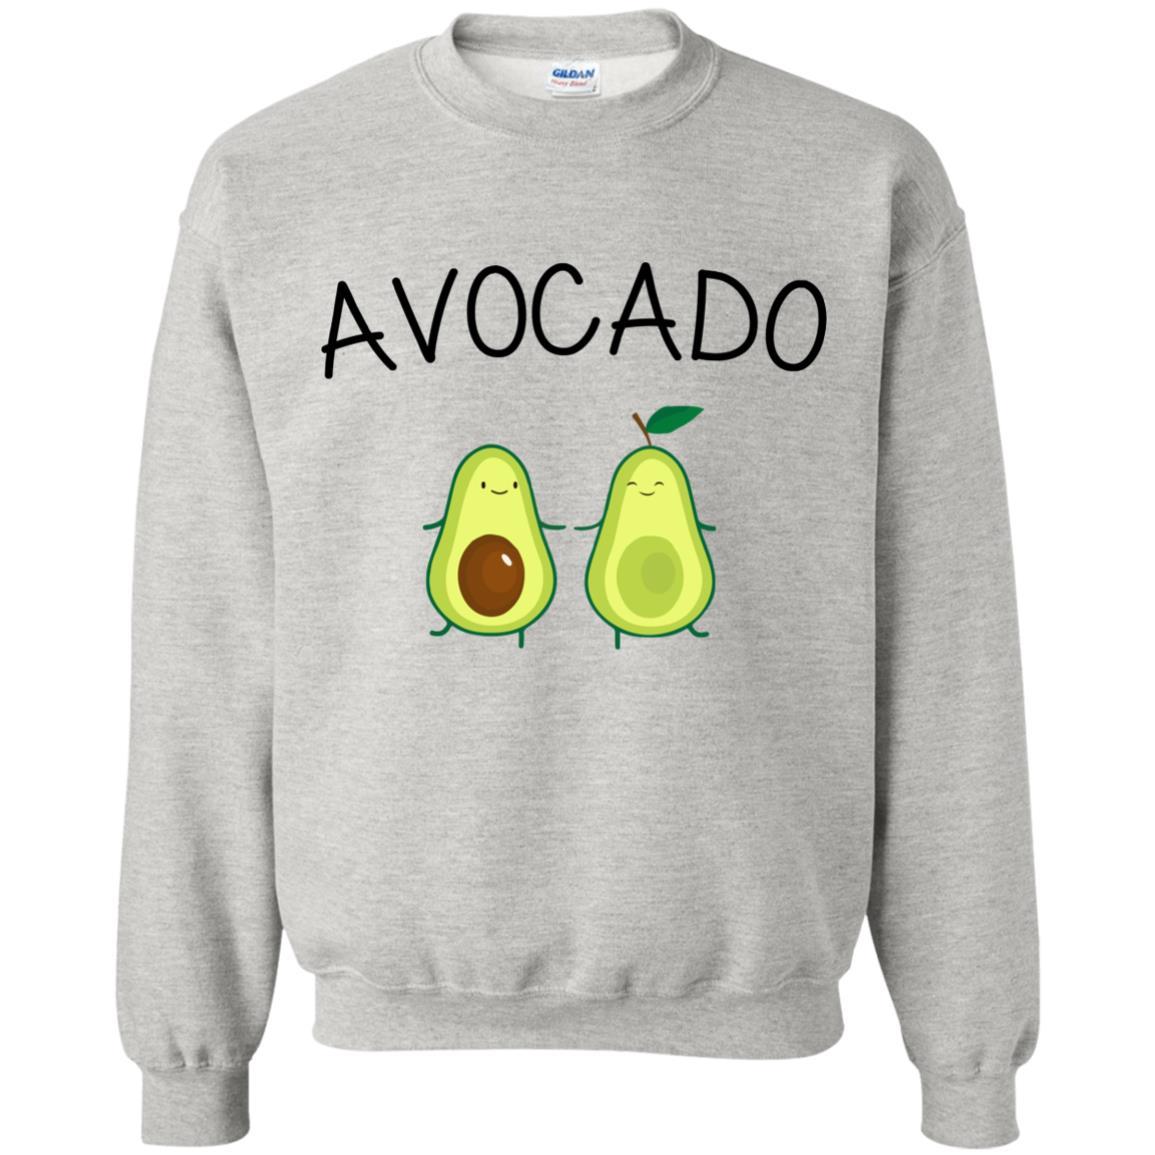 image 19 - Vegan Avocado Shirt, Sweater, Hoodie